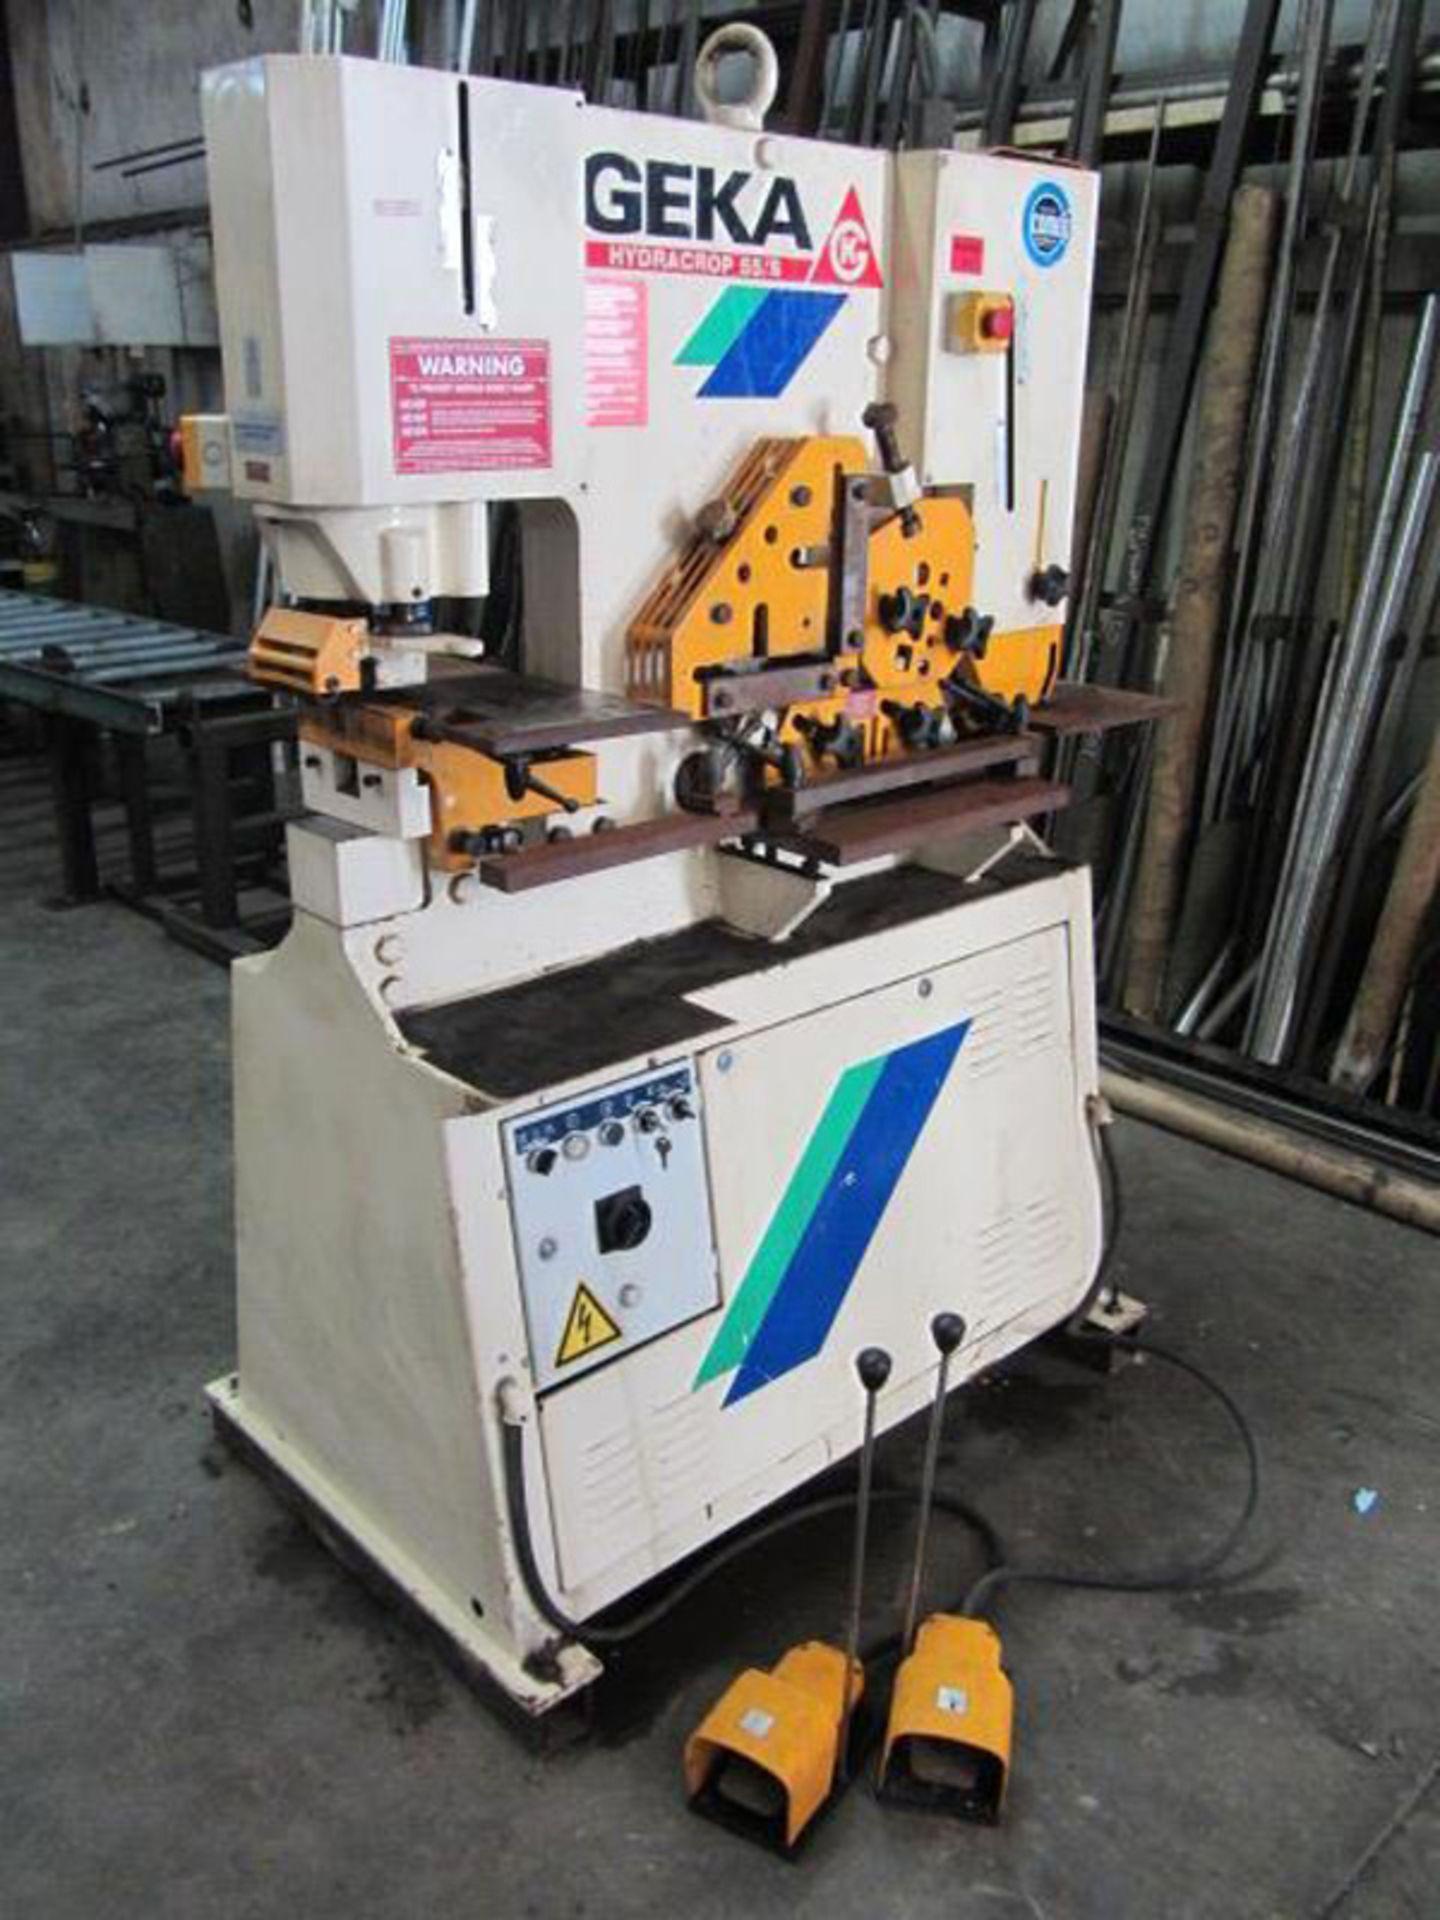 Lot 7 - 1999 Geka Hydraulic Ironworker | 50-Ton, Mdl: Hydracrop 55/S, S/N: 13018 - 8430P